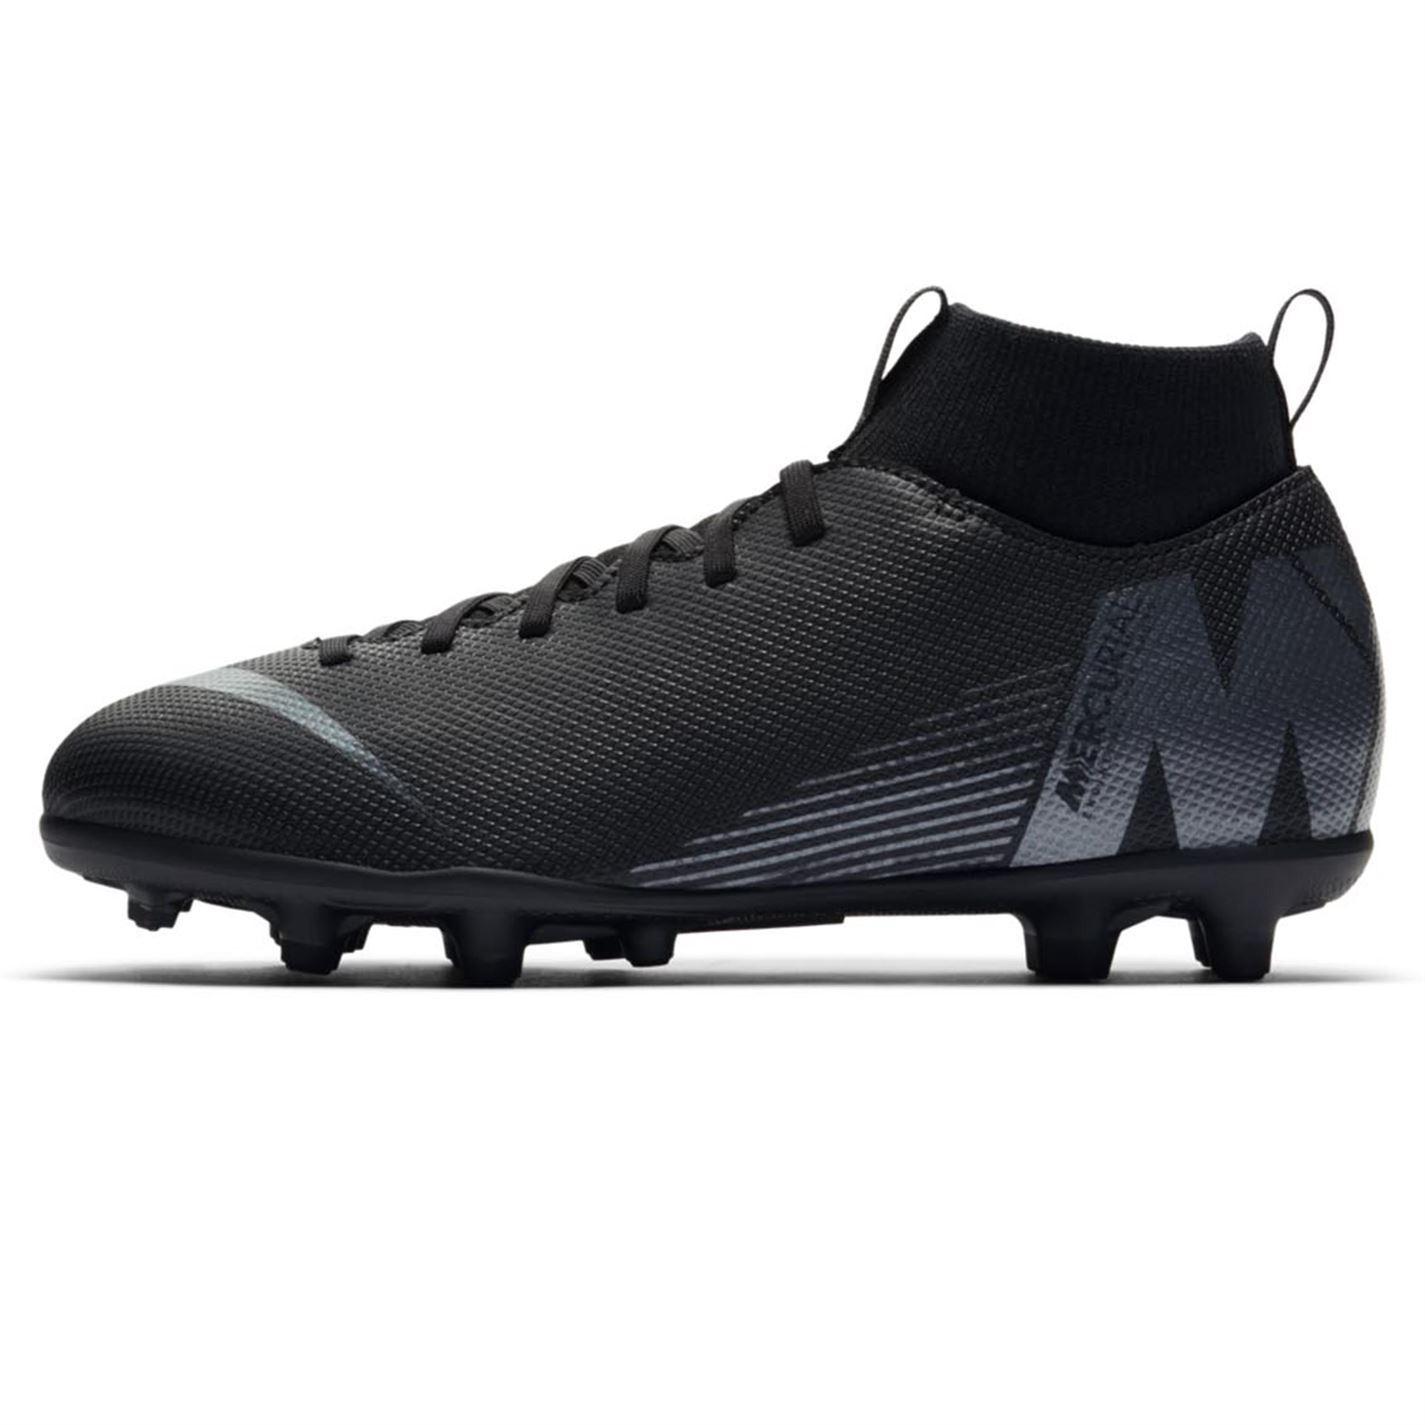 Nike-MERCURIAL-SUPERFLY-Club-DF-TERRA-FERMA-SCARPE-DA-CALCIO-JUNIOR-CALCIO-Cunei miniatura 5